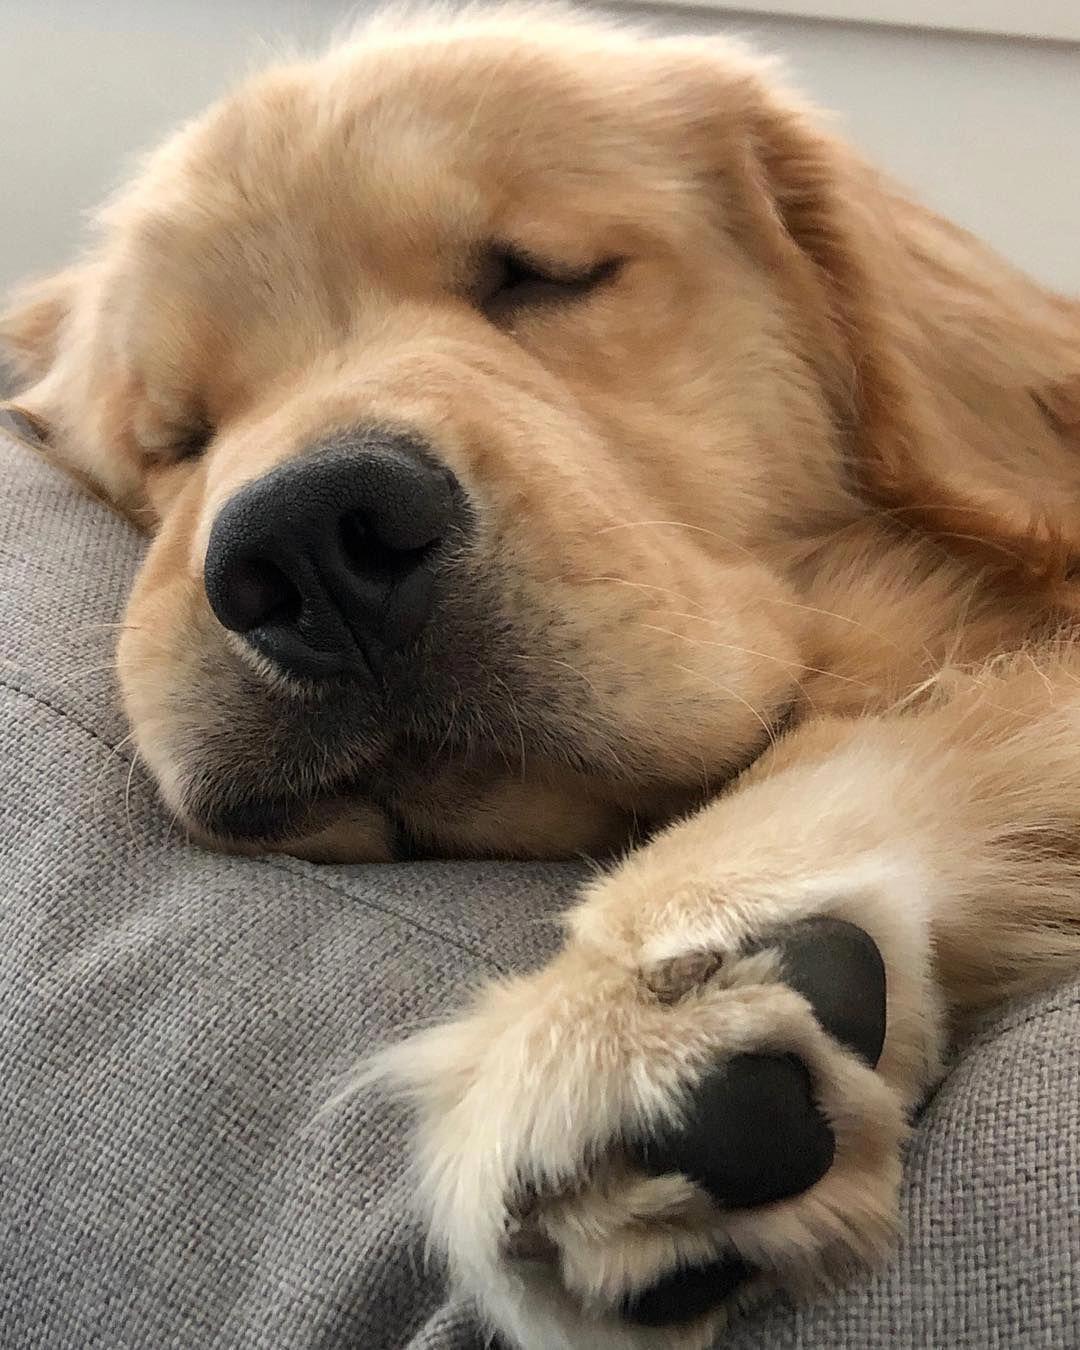 Chester On Instagram Doin Me A Smooshy Sunday Snooze Boop Dailyfluff Pugs Cute Baby Animals Retriever Puppy Dogs